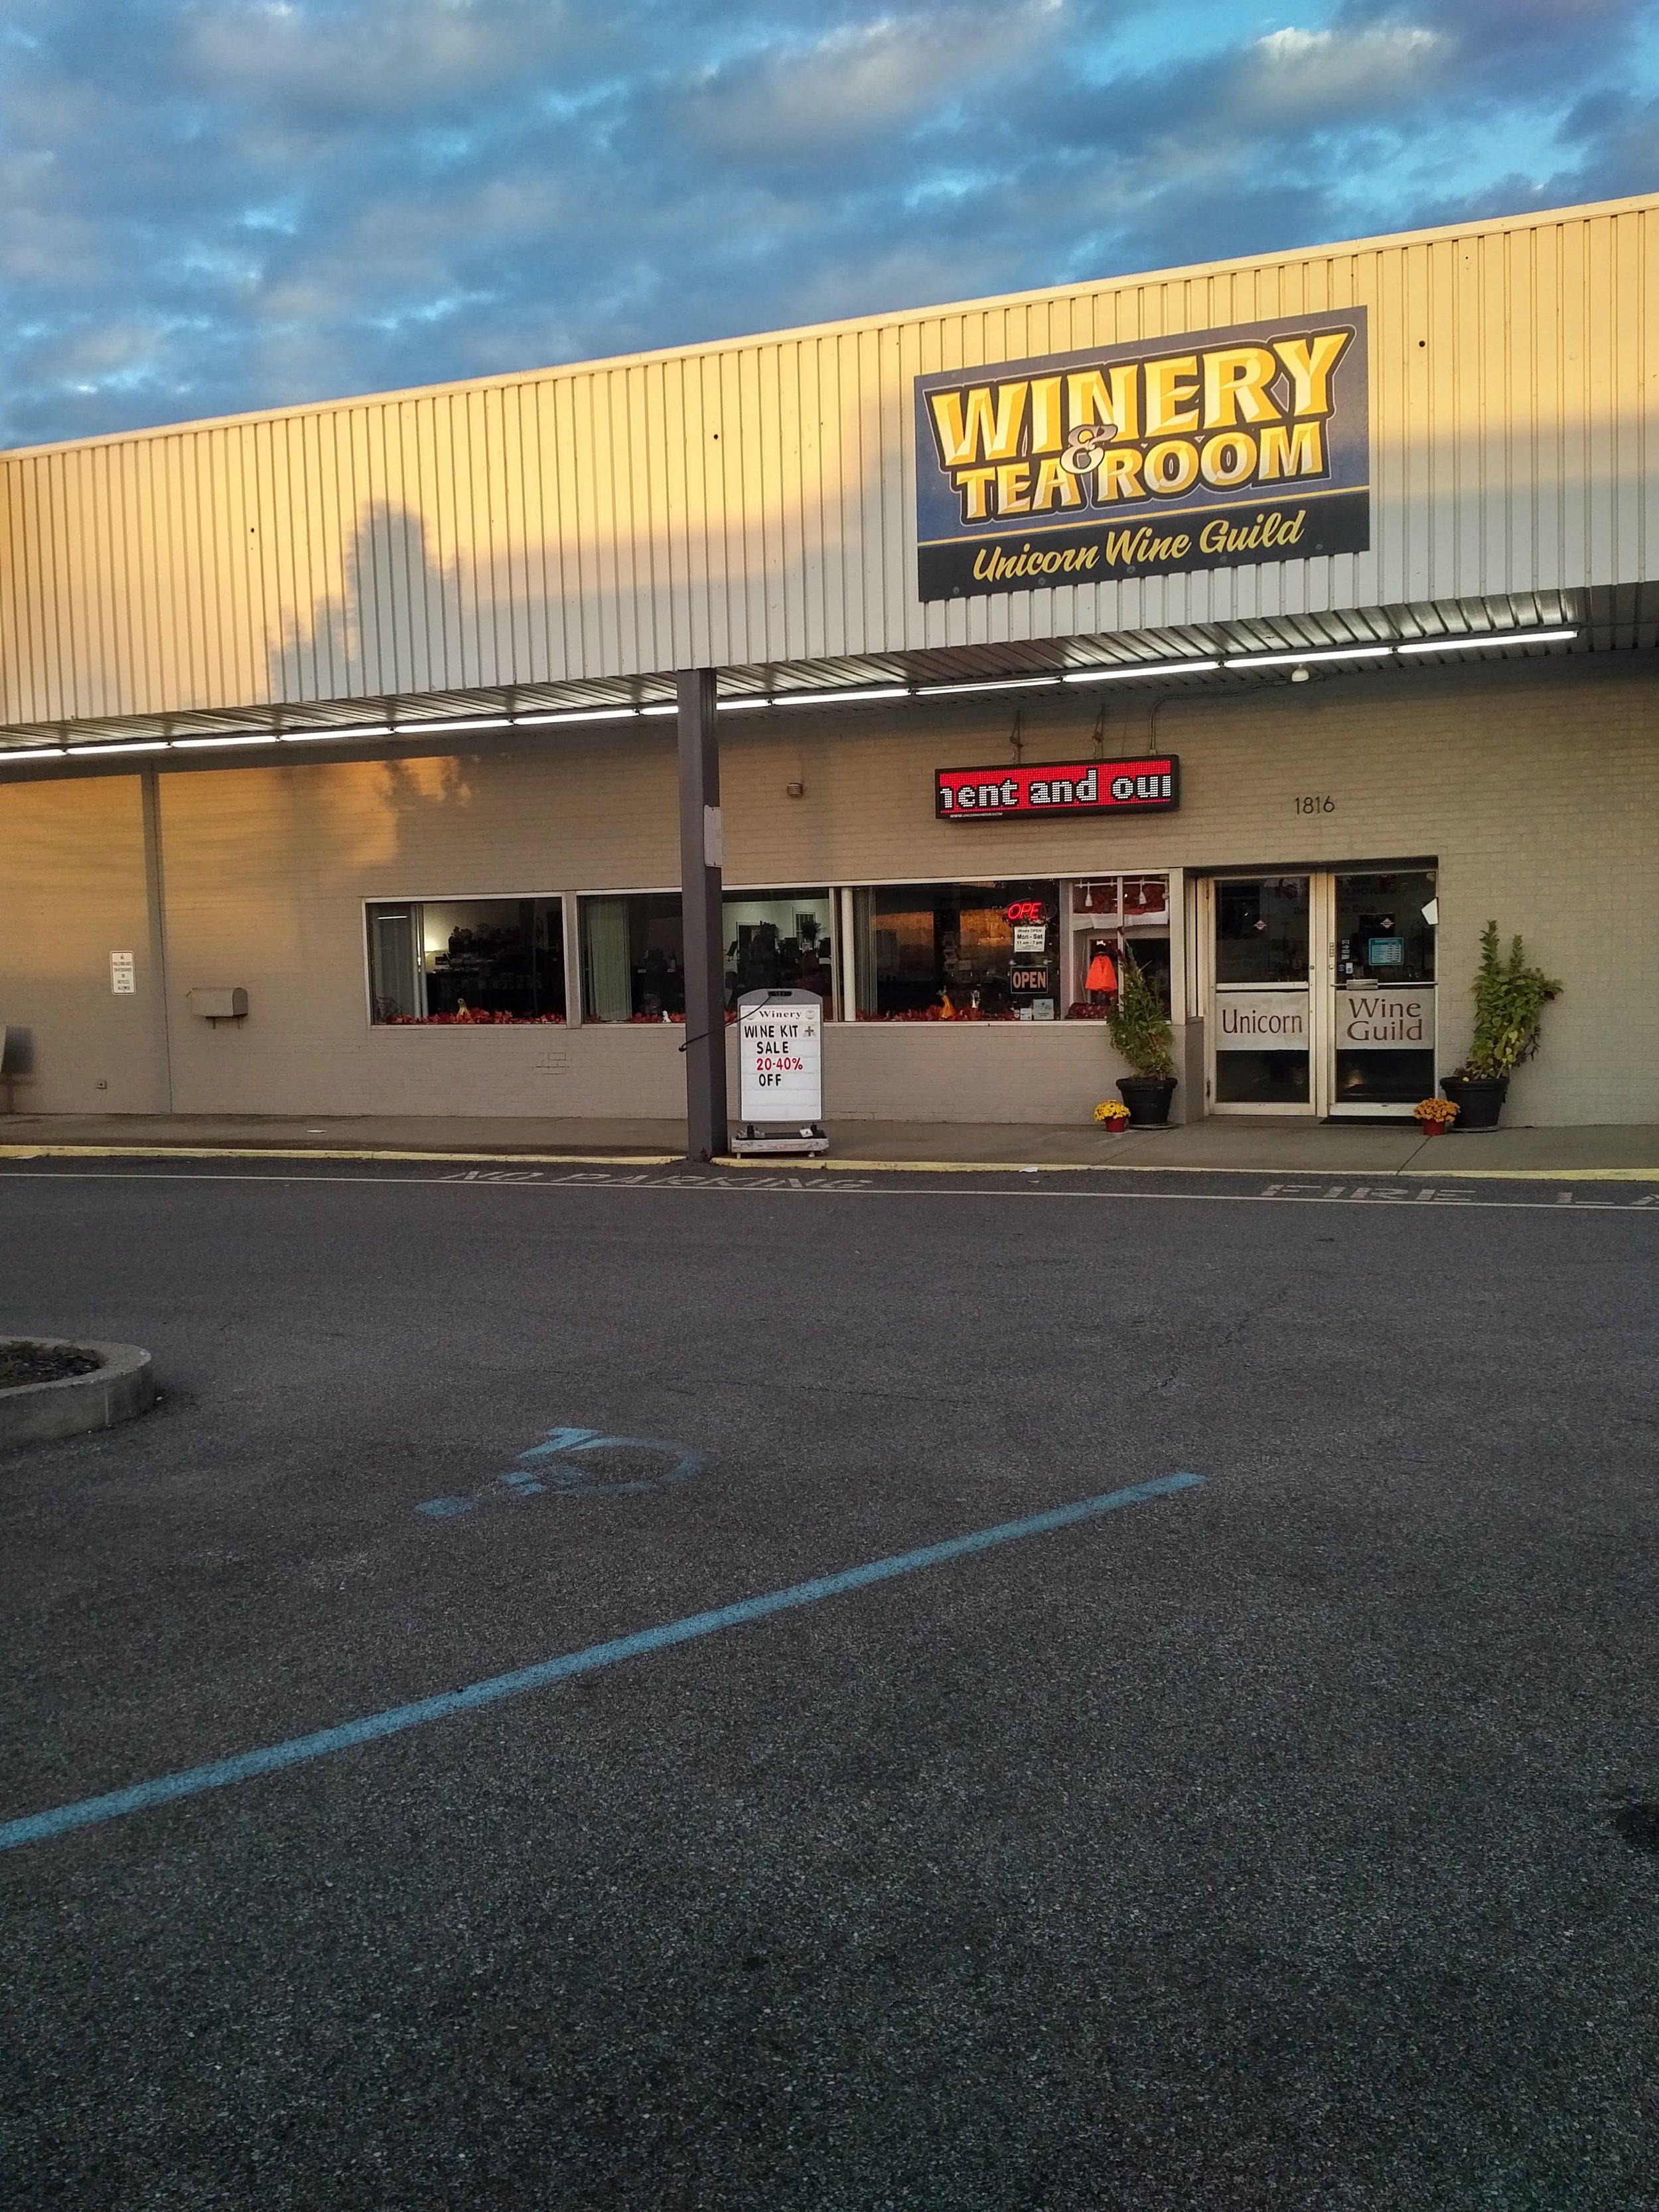 - 1816 Washington Blvd., Belpre, OH 45714Click for Map740-423-1300unicornwineguild.comAppalachian Wine TrailTuscarawas County